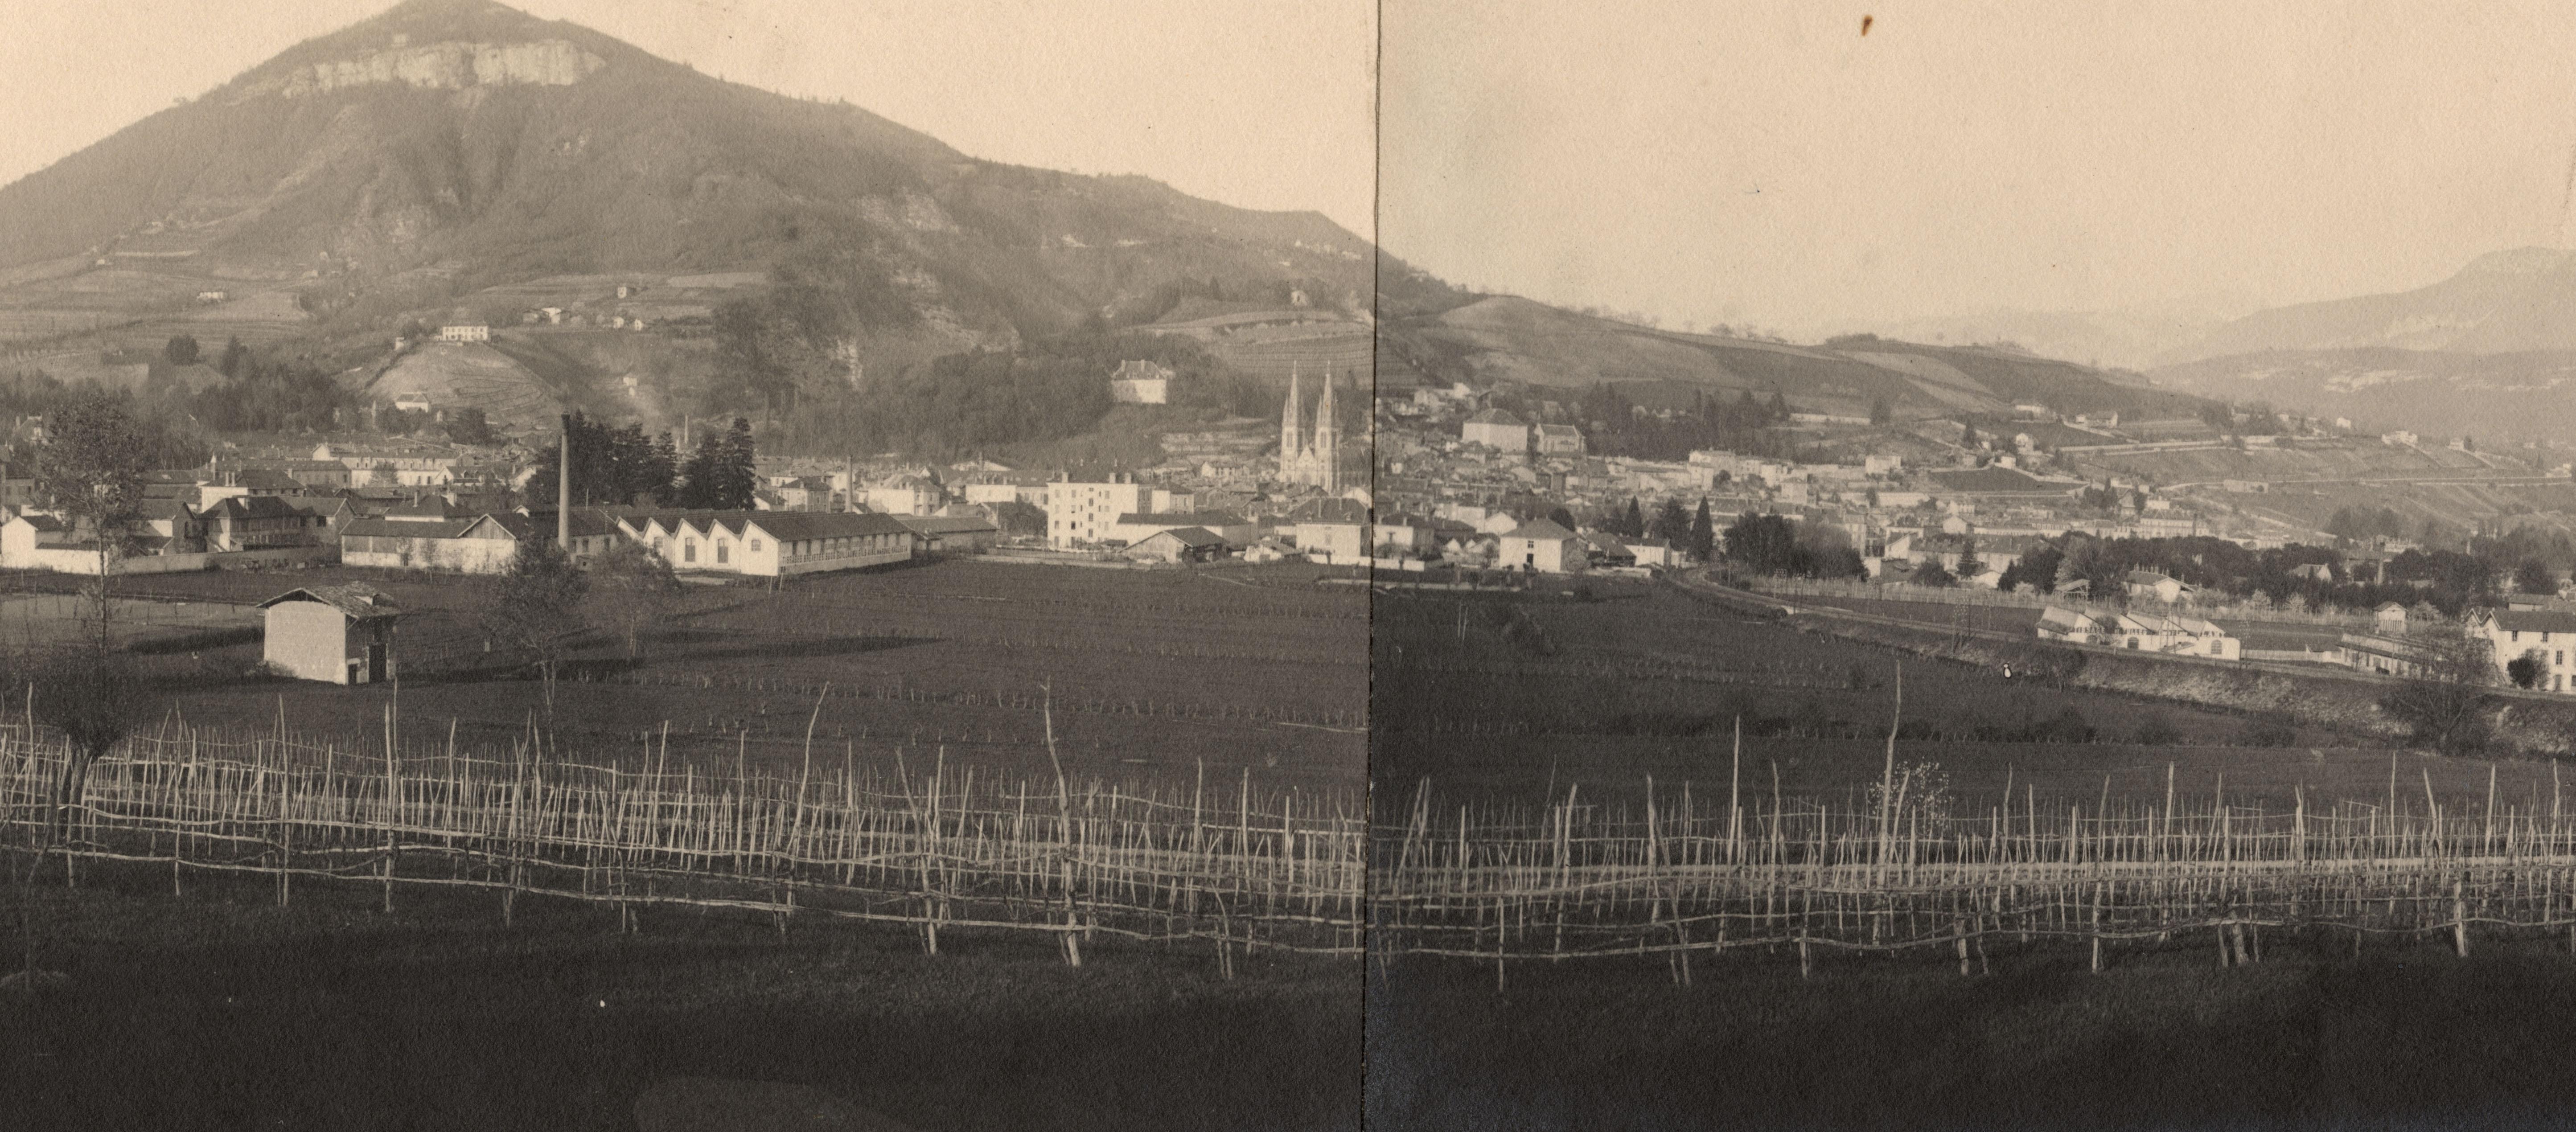 Voiron depuis l'ouest, photographie vers 1920 (Coll. musée dauphinois).